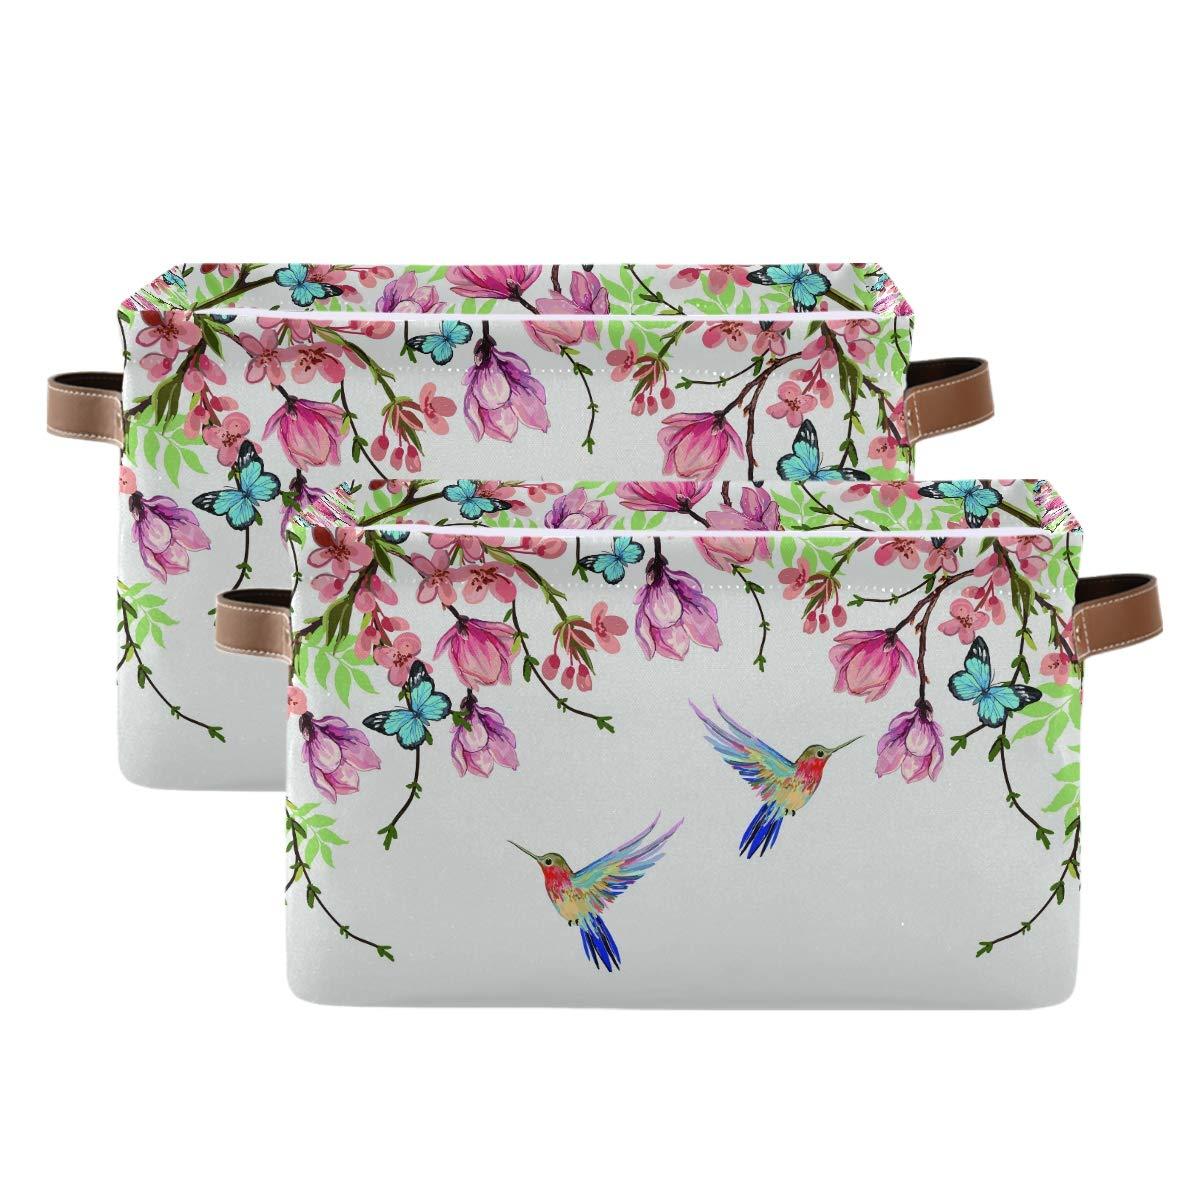 WXLIFE Storage Basket Free shipping on posting reviews Bins Hummingbird Butterfly Animal online shop Flower L